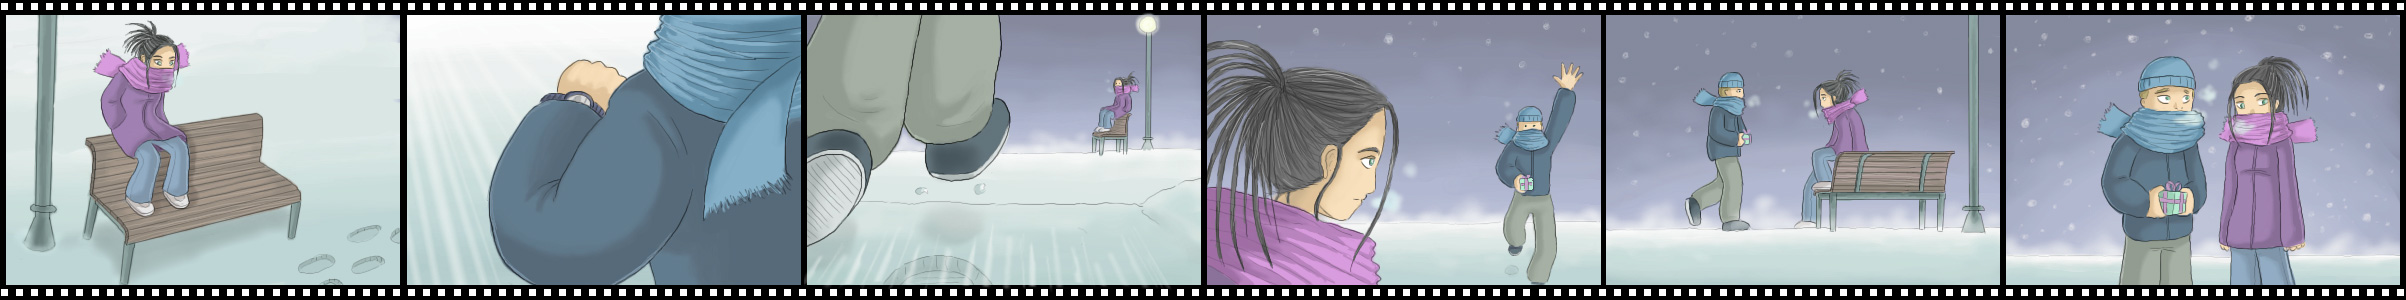 Snow movie by neiba